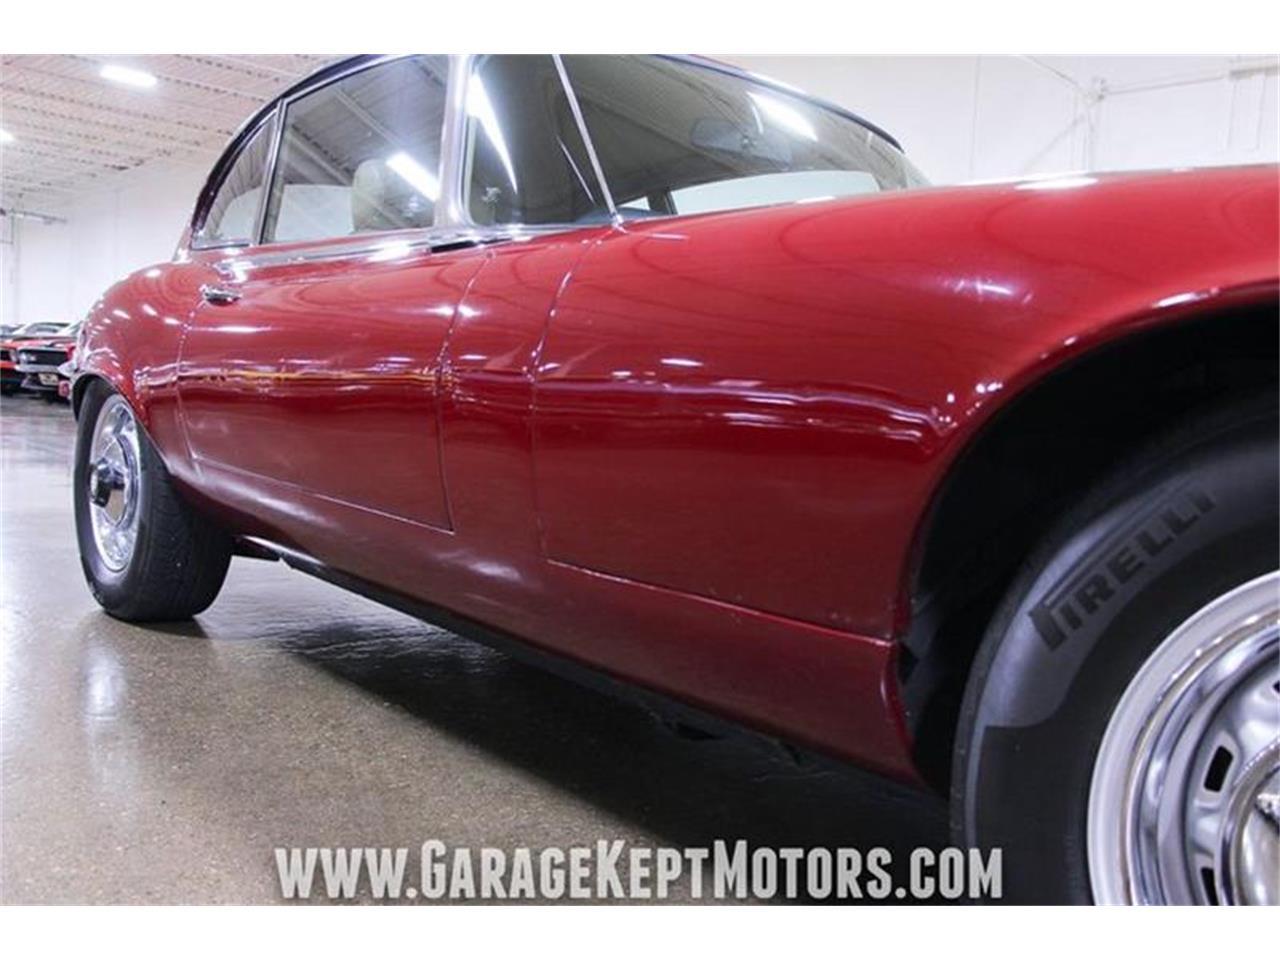 Large Picture of Classic 1971 Jaguar E-Type - $62,900.00 Offered by Garage Kept Motors - QP0V